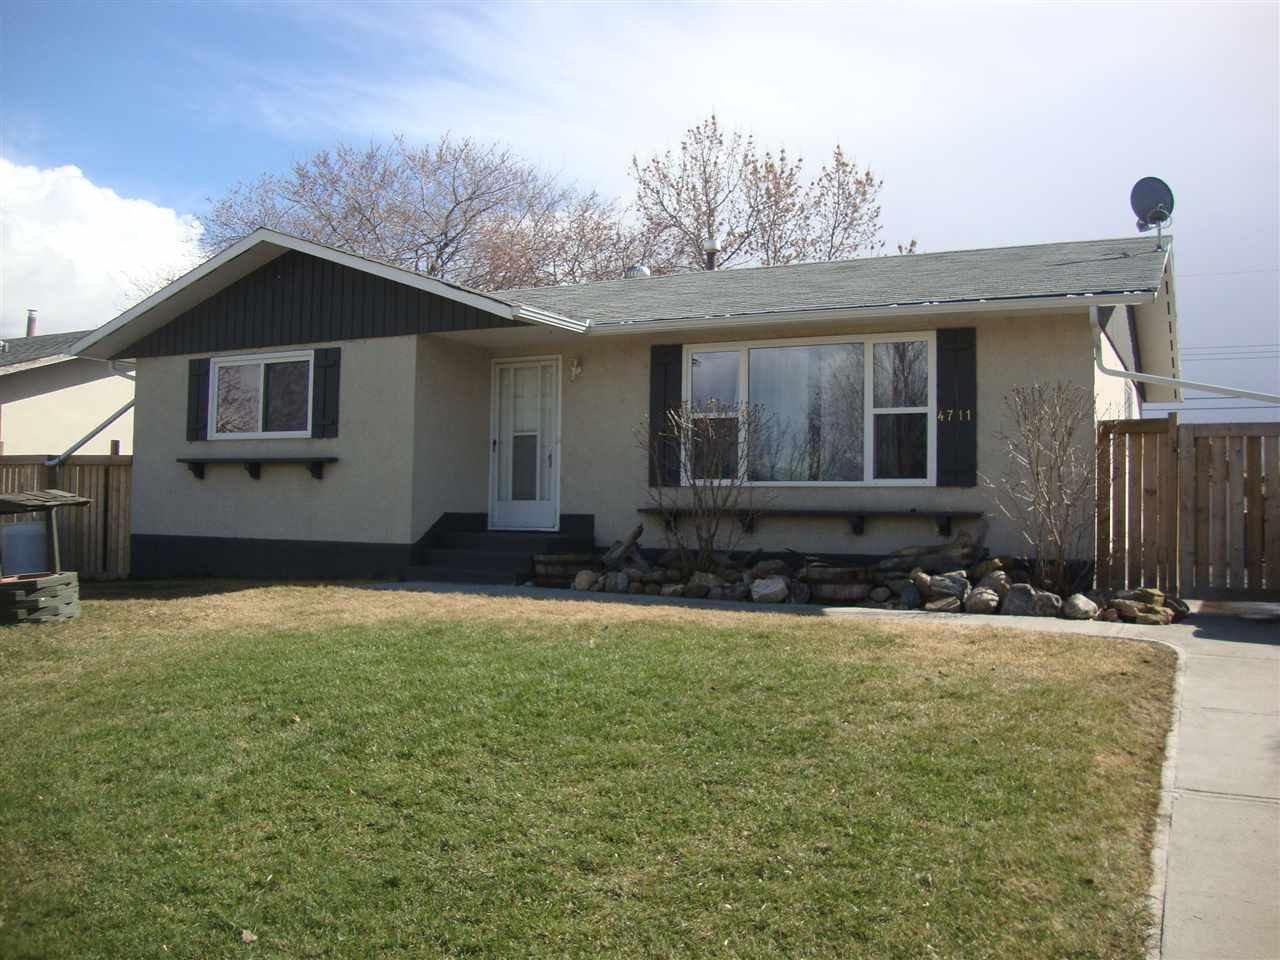 Photo 1: Photos: 4711 51A Avenue: Bon Accord House for sale : MLS®# E4149195